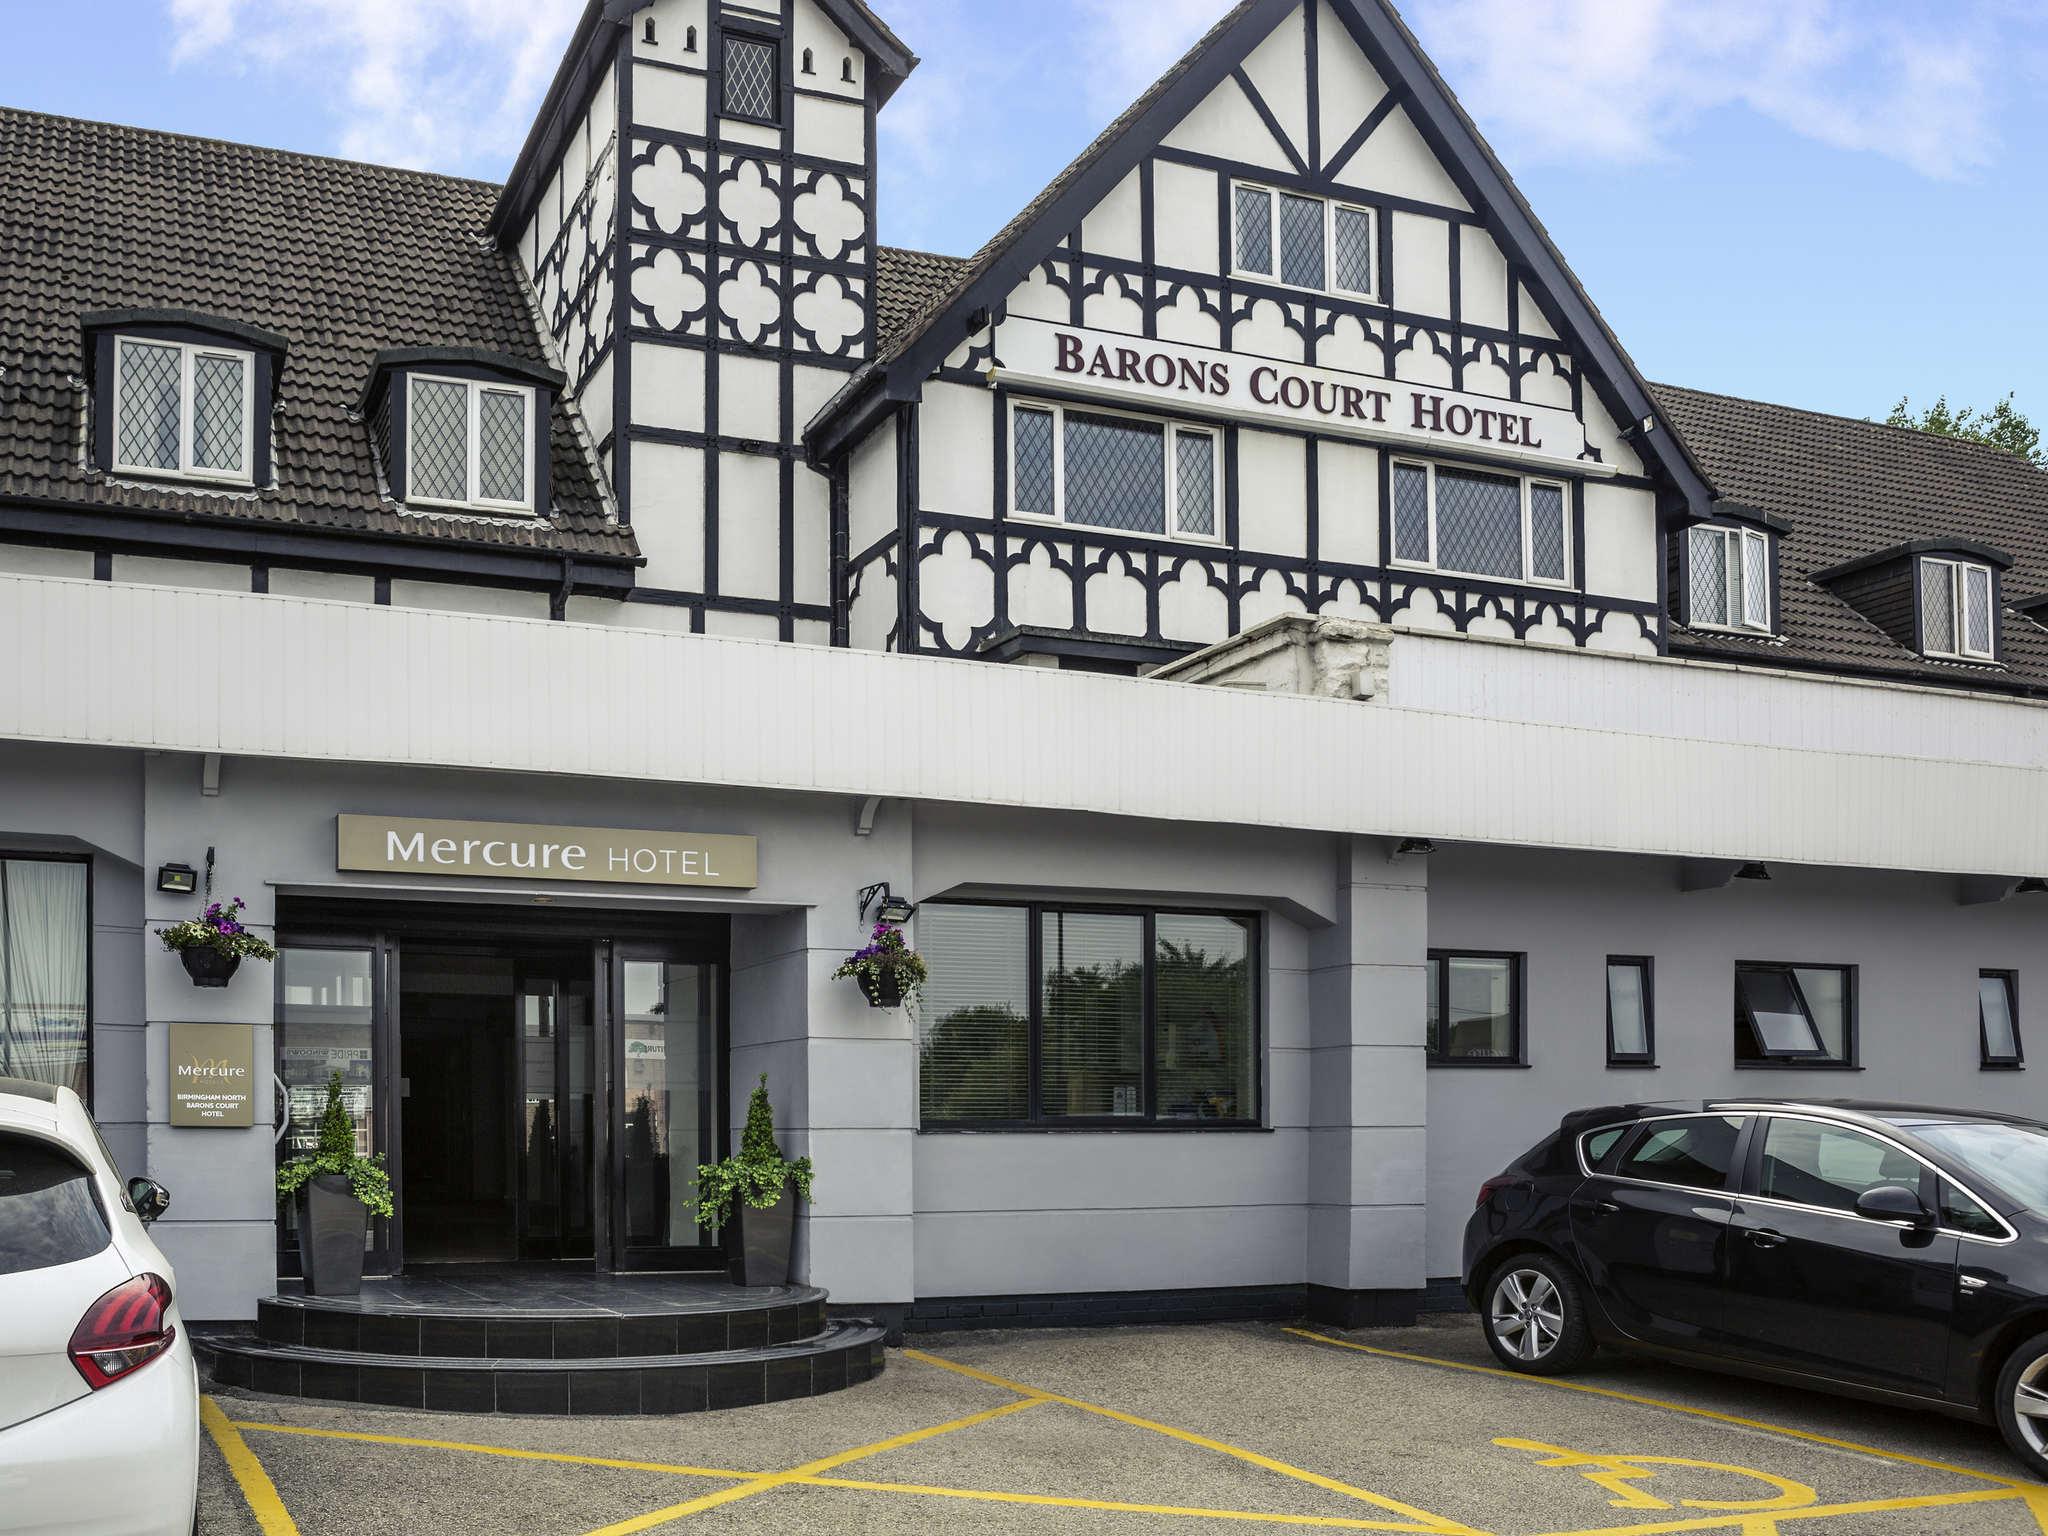 Hotel - Mercure Birmingham North Barons Court Hotel